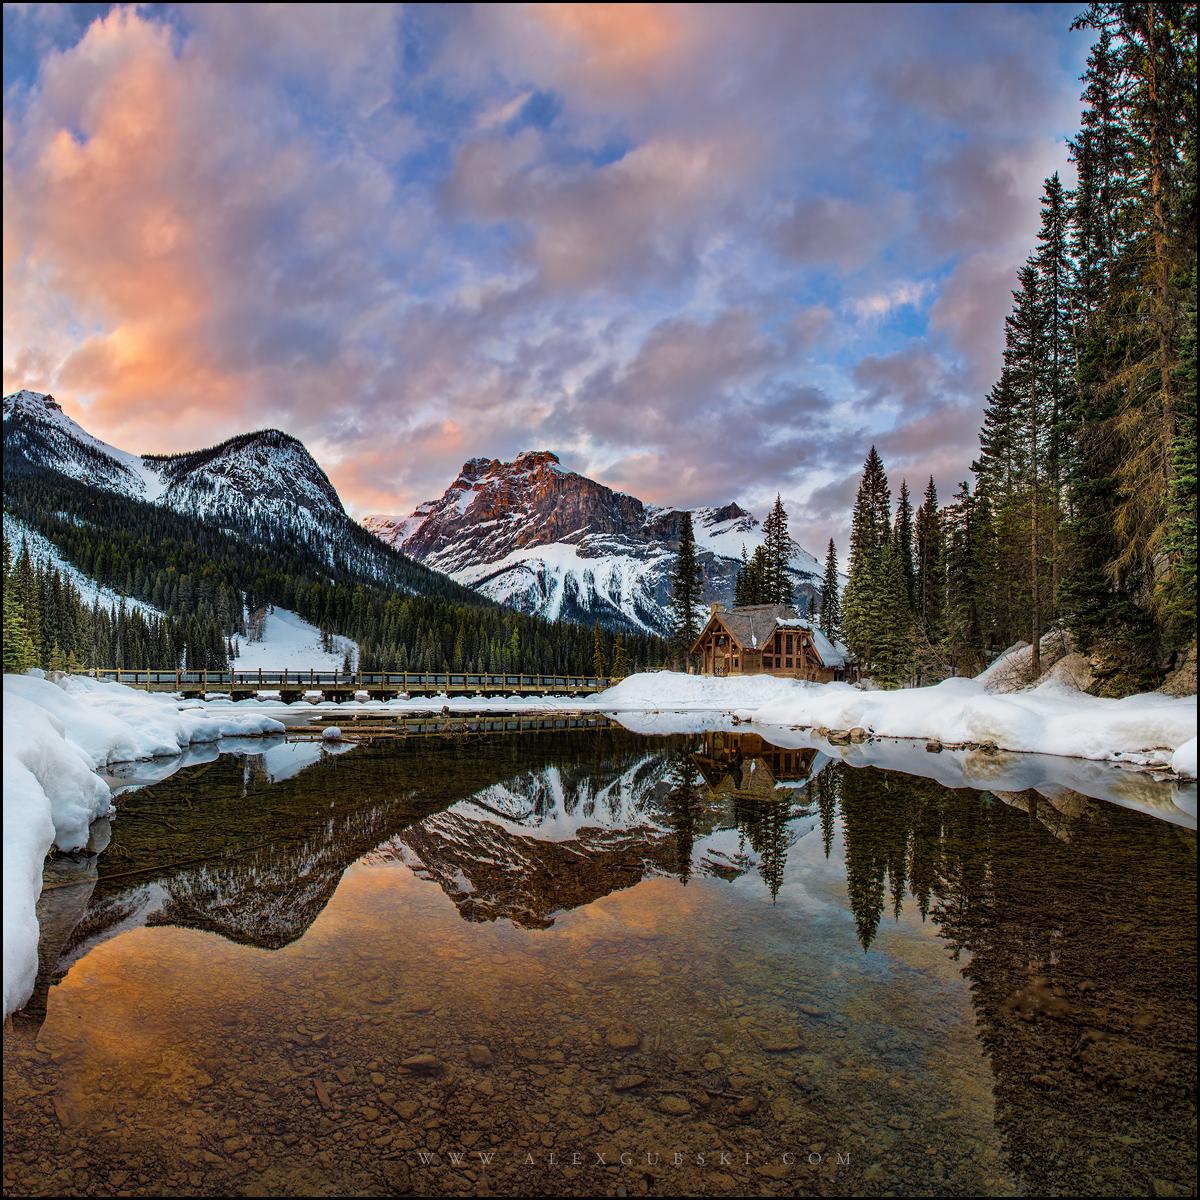 566_Calgary_photographer_Alexander_Gubski